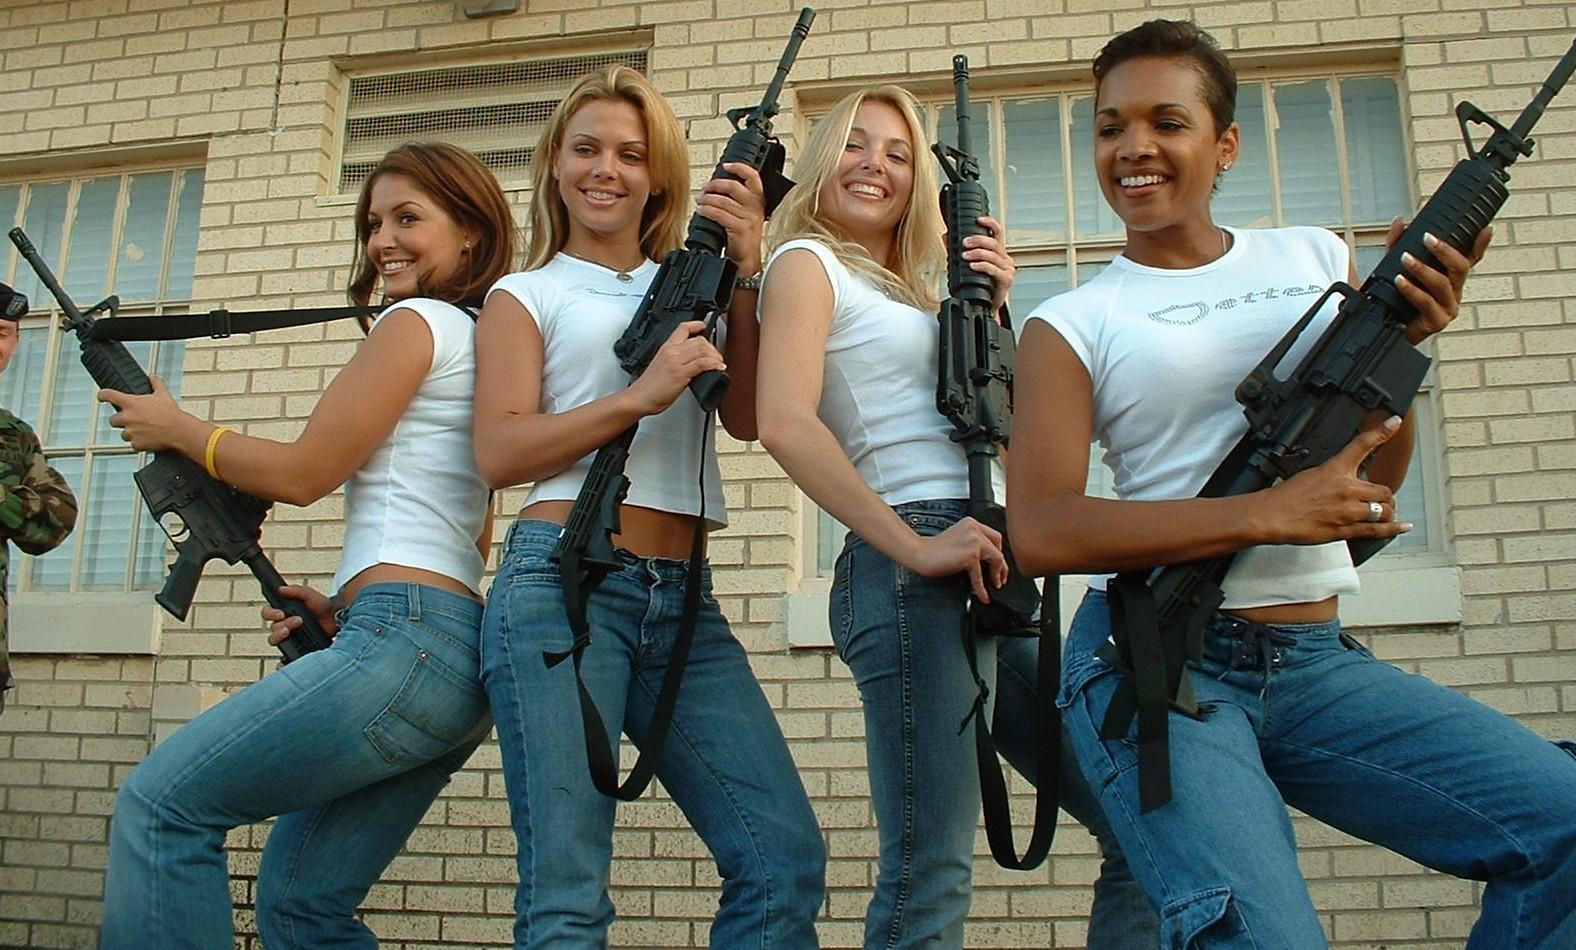 teachers carrying guns in schools essay